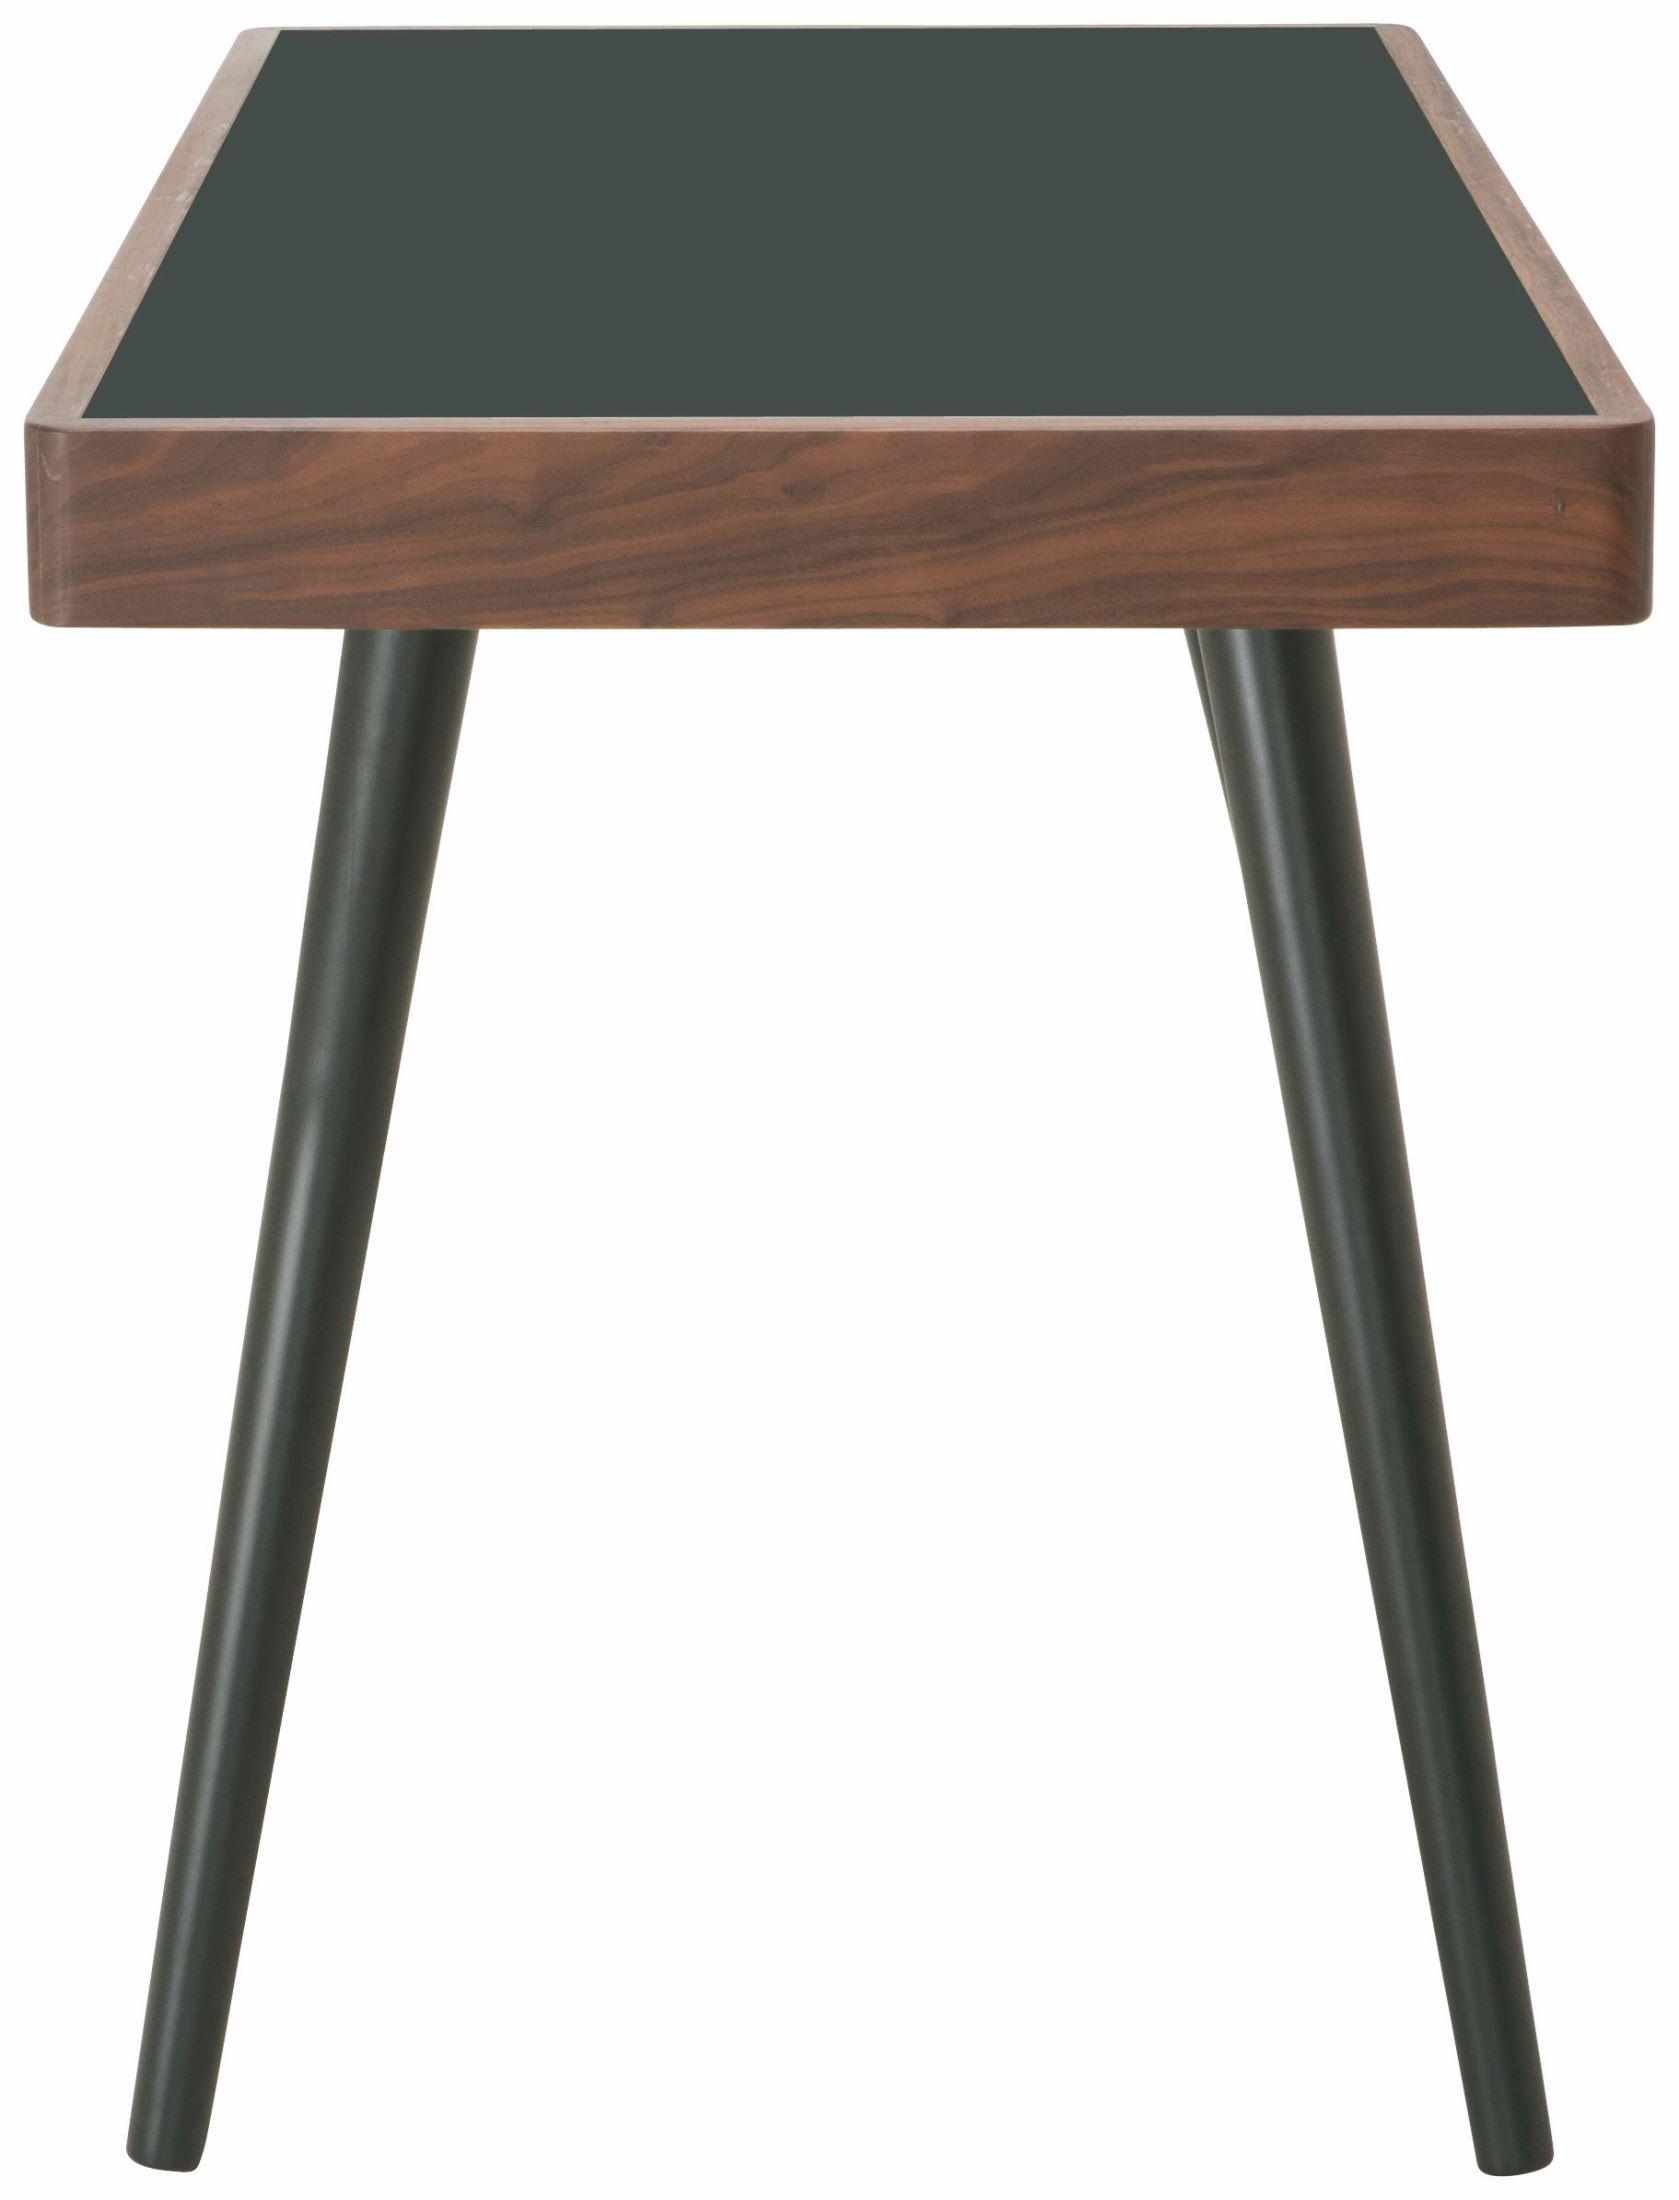 Matte Black Melamine Desk Table HGEM498 Nuevo